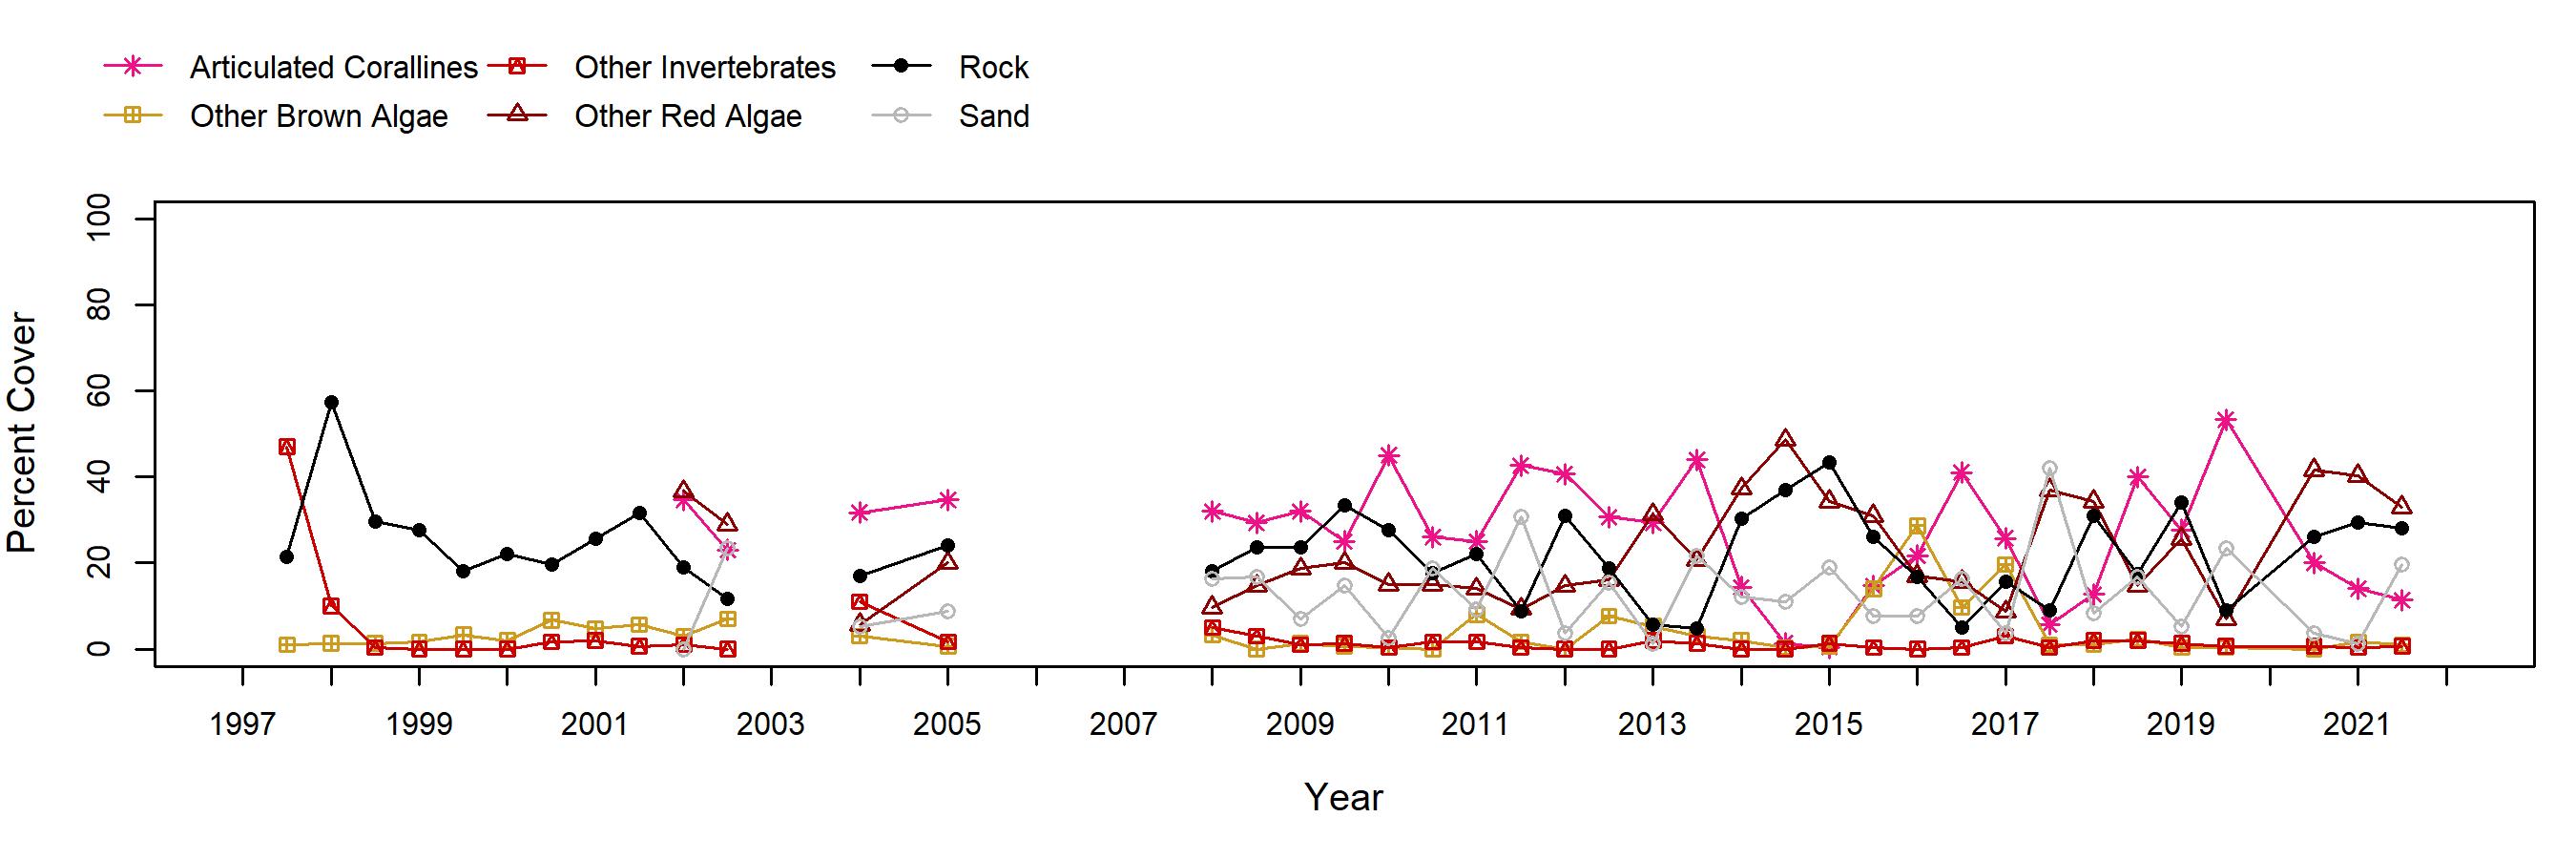 Scripps Reef red algae trend plot